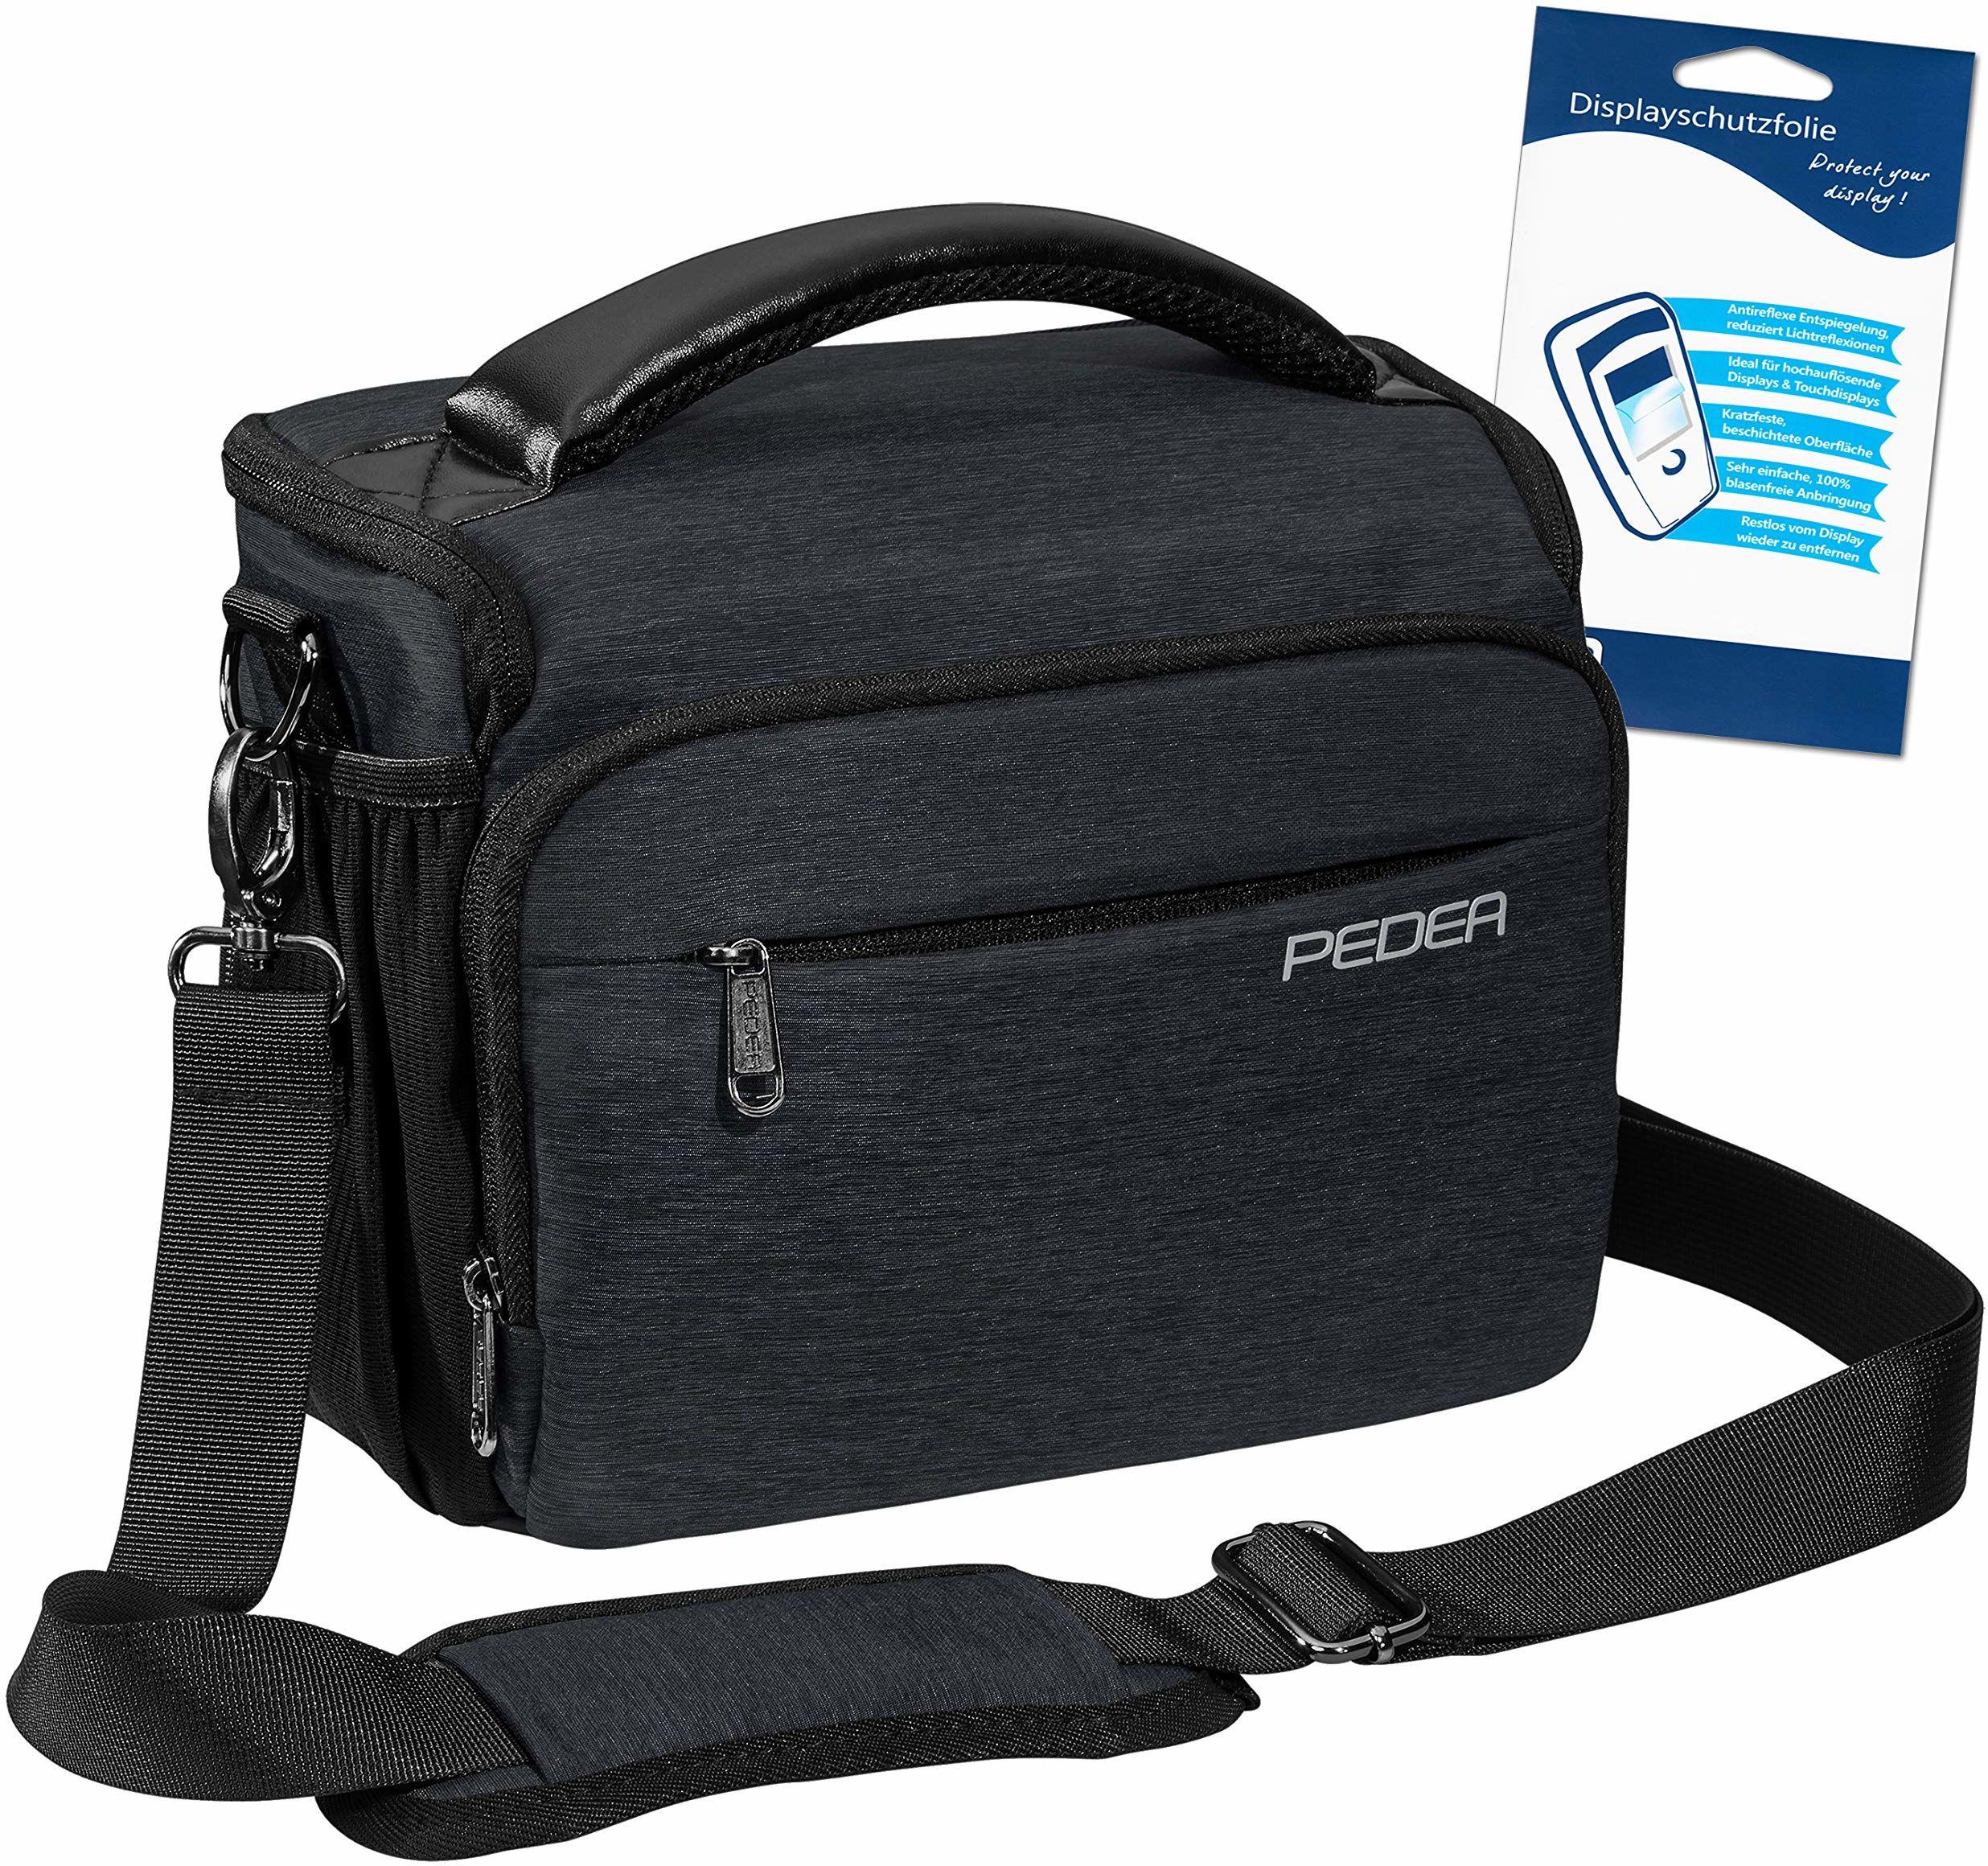 "PEDEA DSLR torba na aparat""Noble"" z folią ochronną na wyświetlacz do Canon EOS 5D Mark II 400D 2000D / Nikon D60 D80 D90 D3100 D3200 D3300 D3400 D5300 D7100 / Pentax K 30 K 500 K, rozm. XL antracyt"